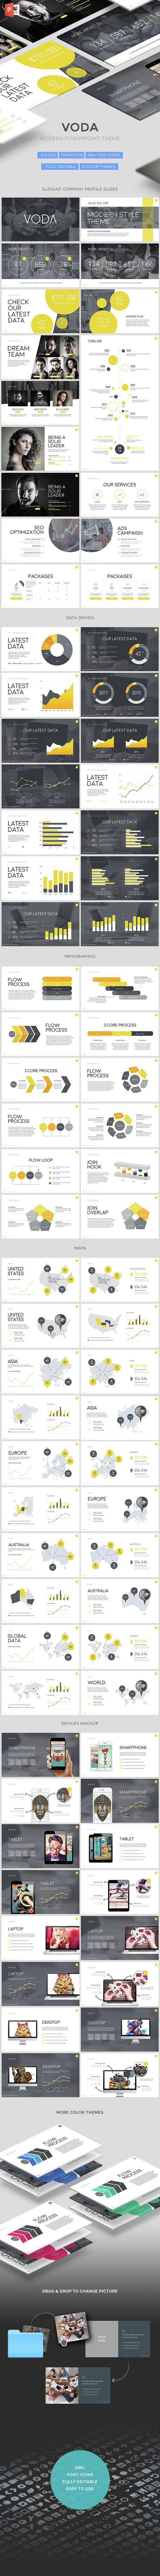 Voda - Creative Powerpoint Template (PowerPoint Templates):